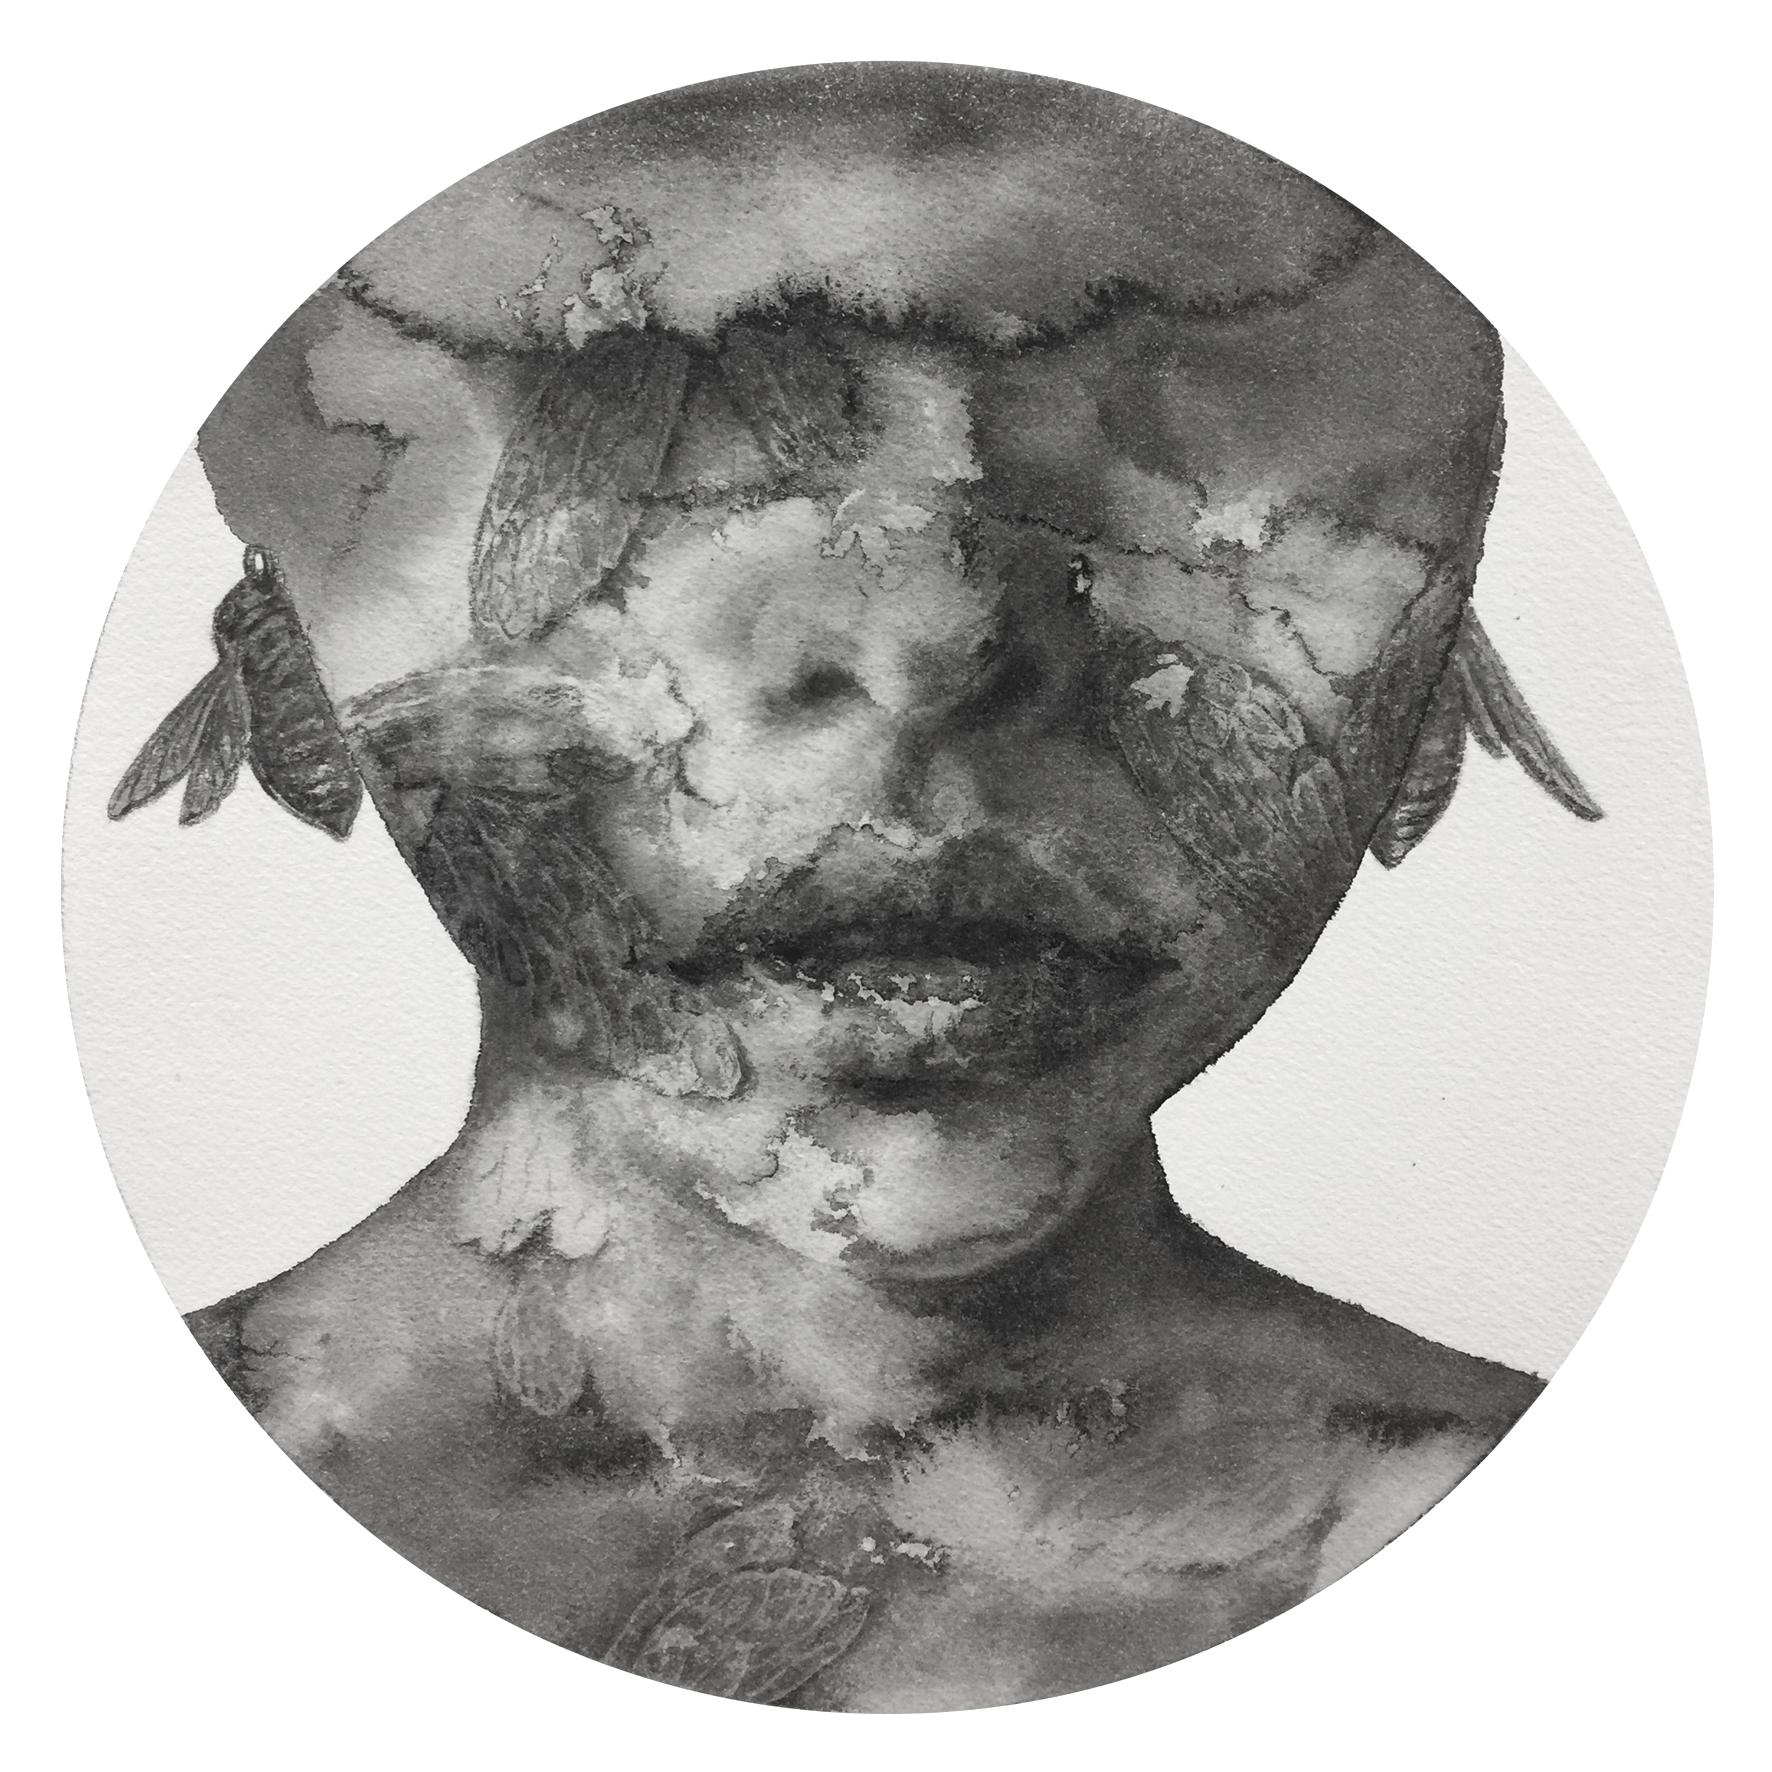 Reflection #11 (Contemporary Chinese Artist Shanlin Ye at Jim Kempner Fine Art)